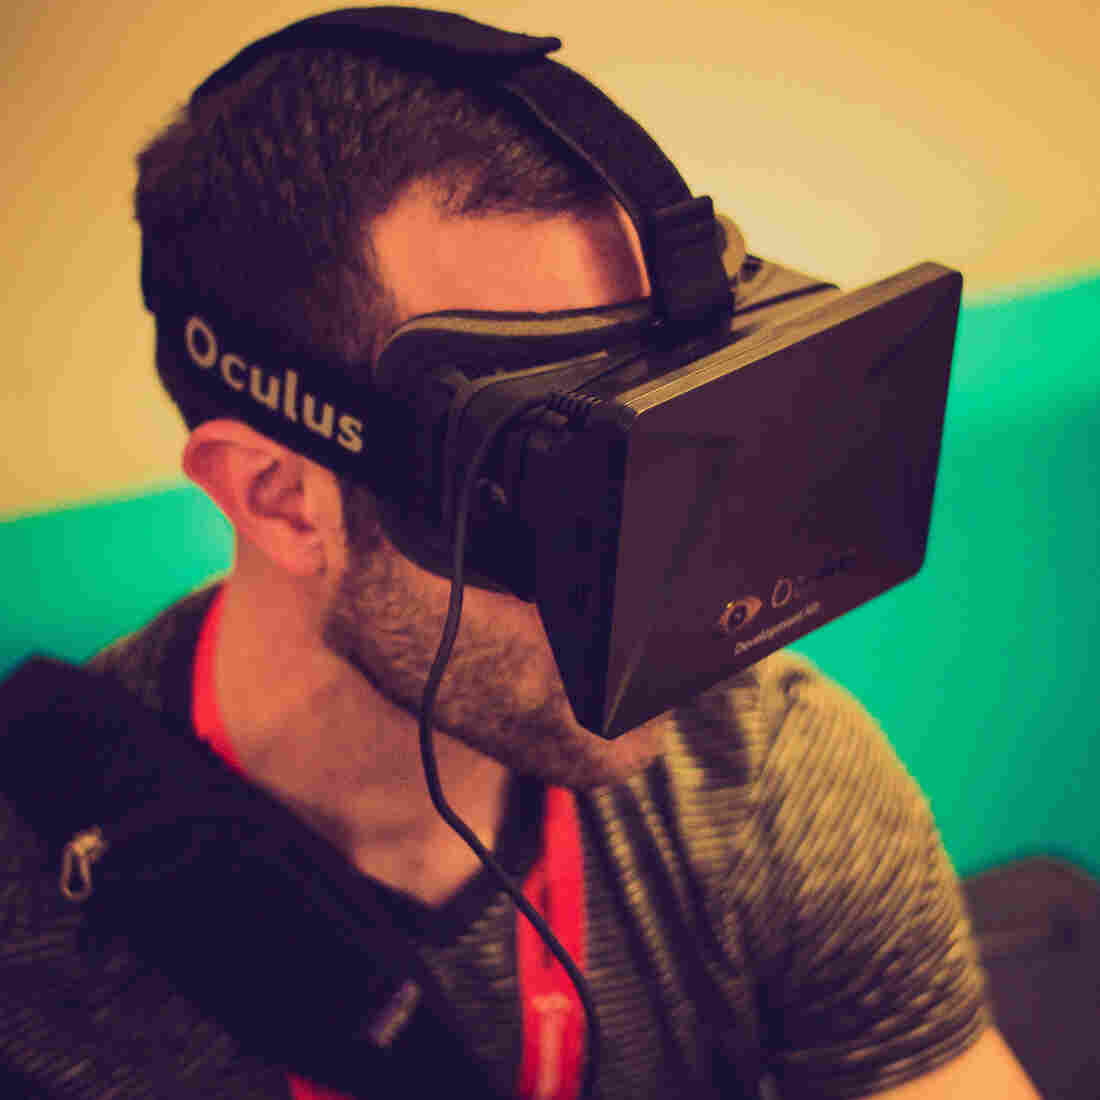 Facebook Will Acquire Virtual Reality Company For $2 Billion